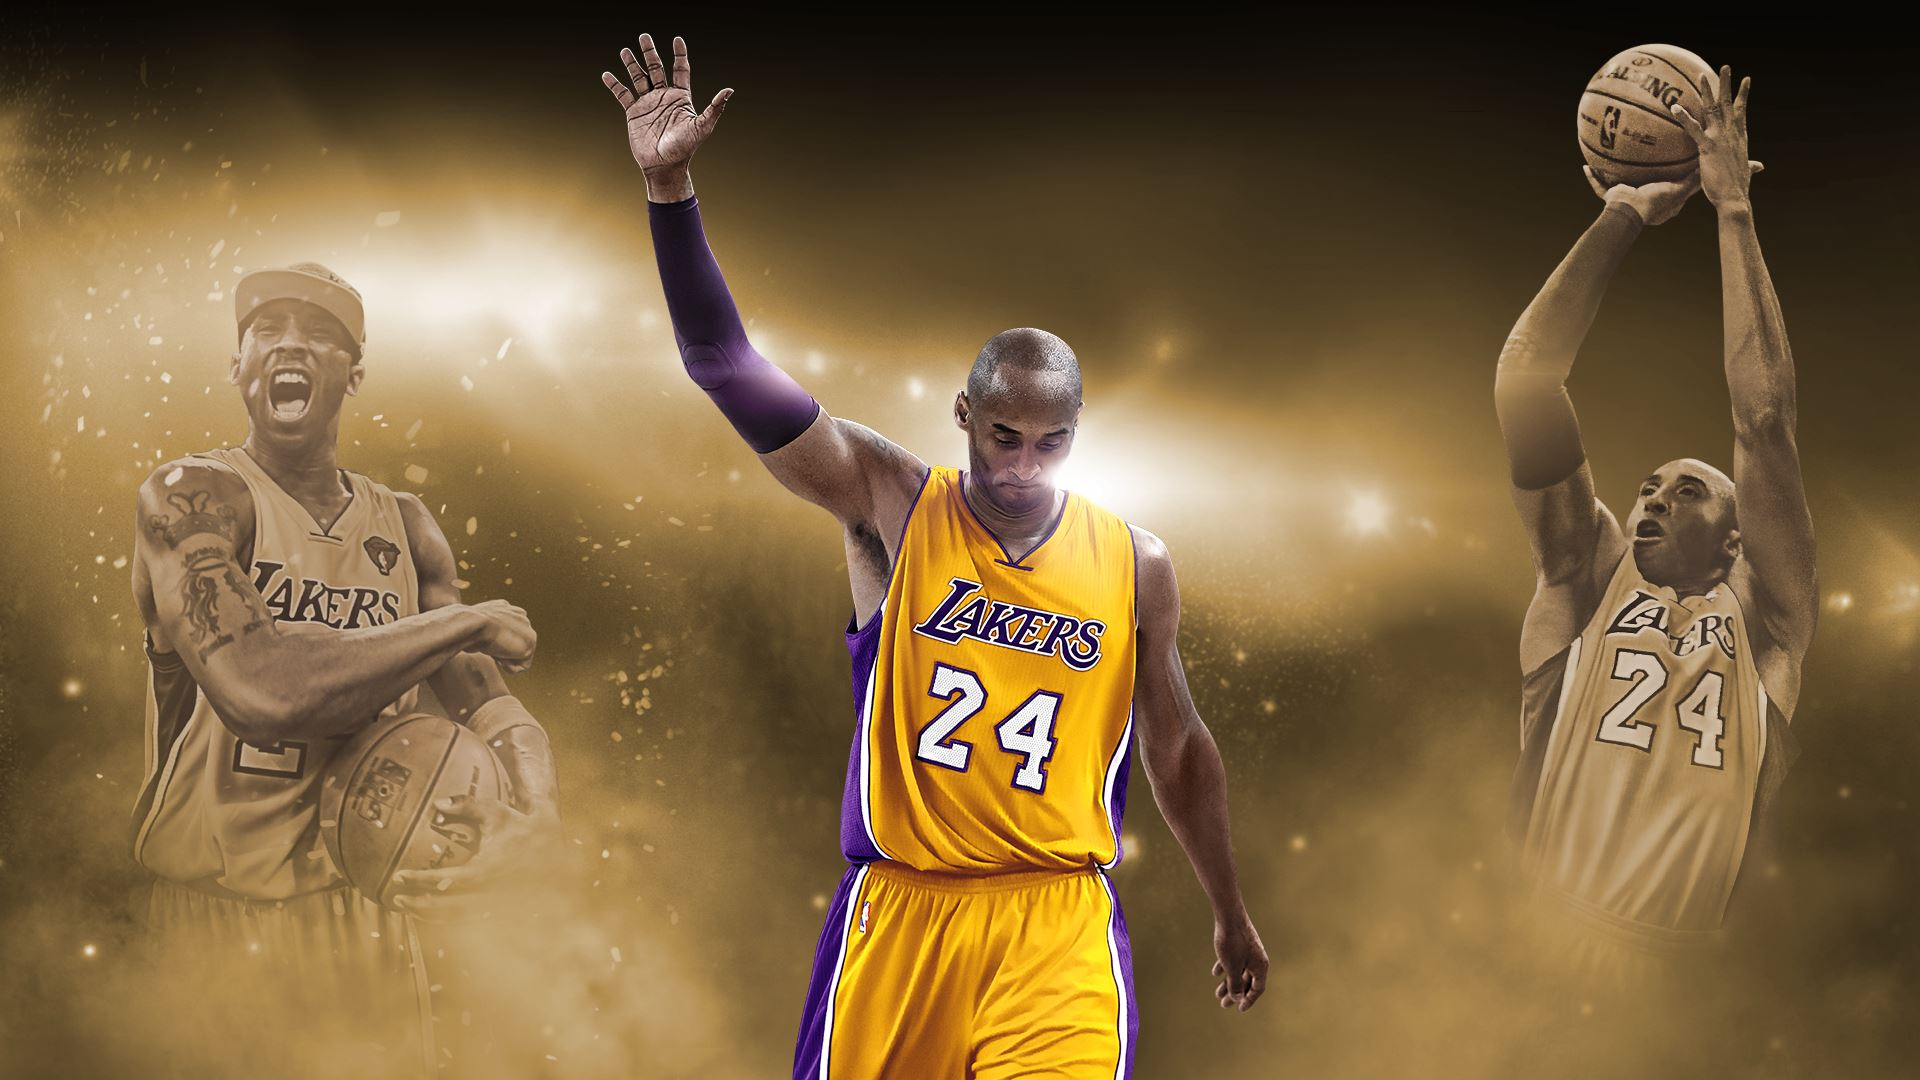 NBA-2k17-xboxone-s-gamersrd.com